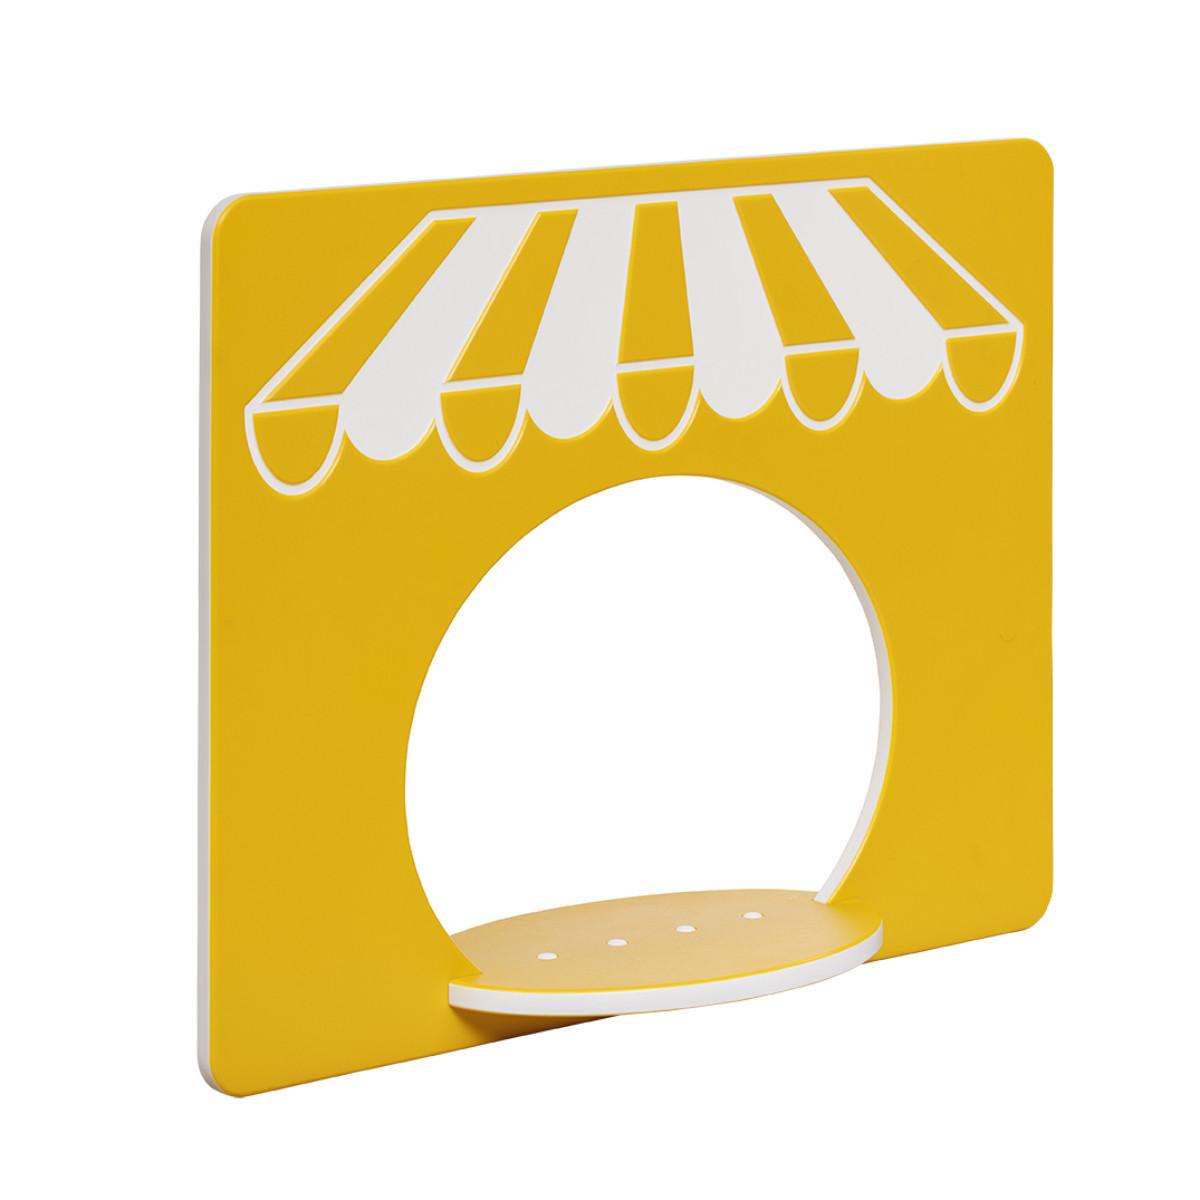 Ігрова HDPE панель Магазин KBT